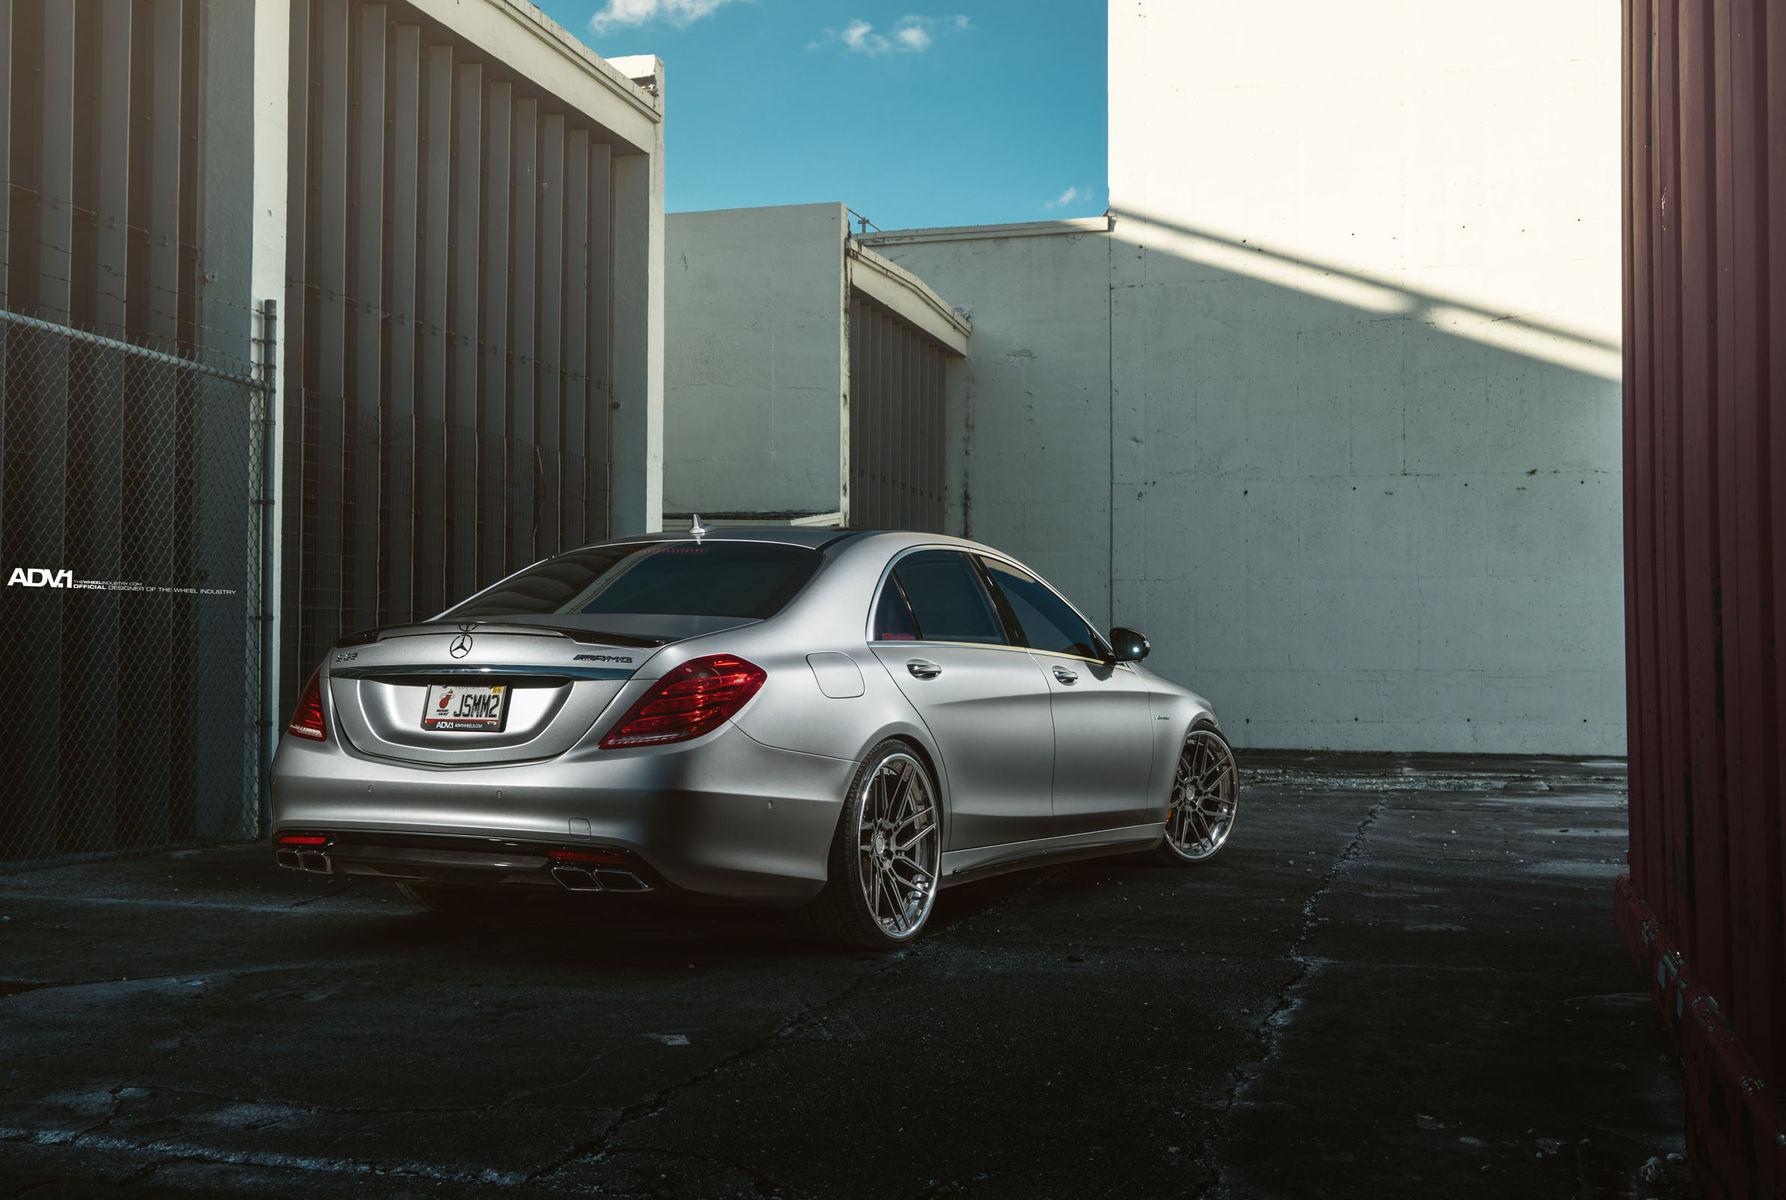 Mercedes-Benz S-Class | Mercedes S6 AMG Sedan